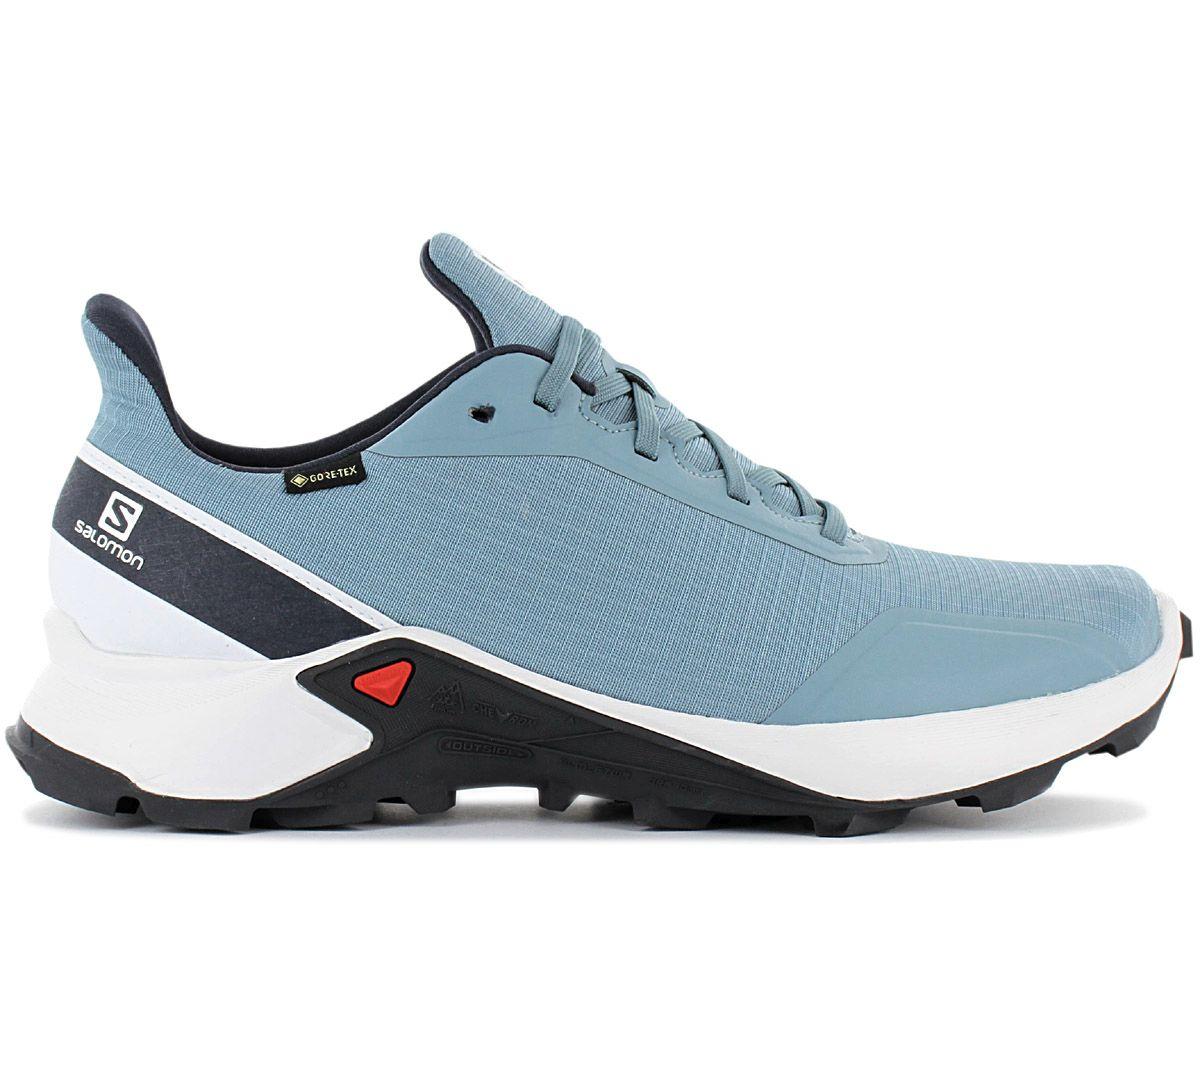 Salomon Alphacross gtx - gore-tex - 409610 Men's trail running Shoes   eBay